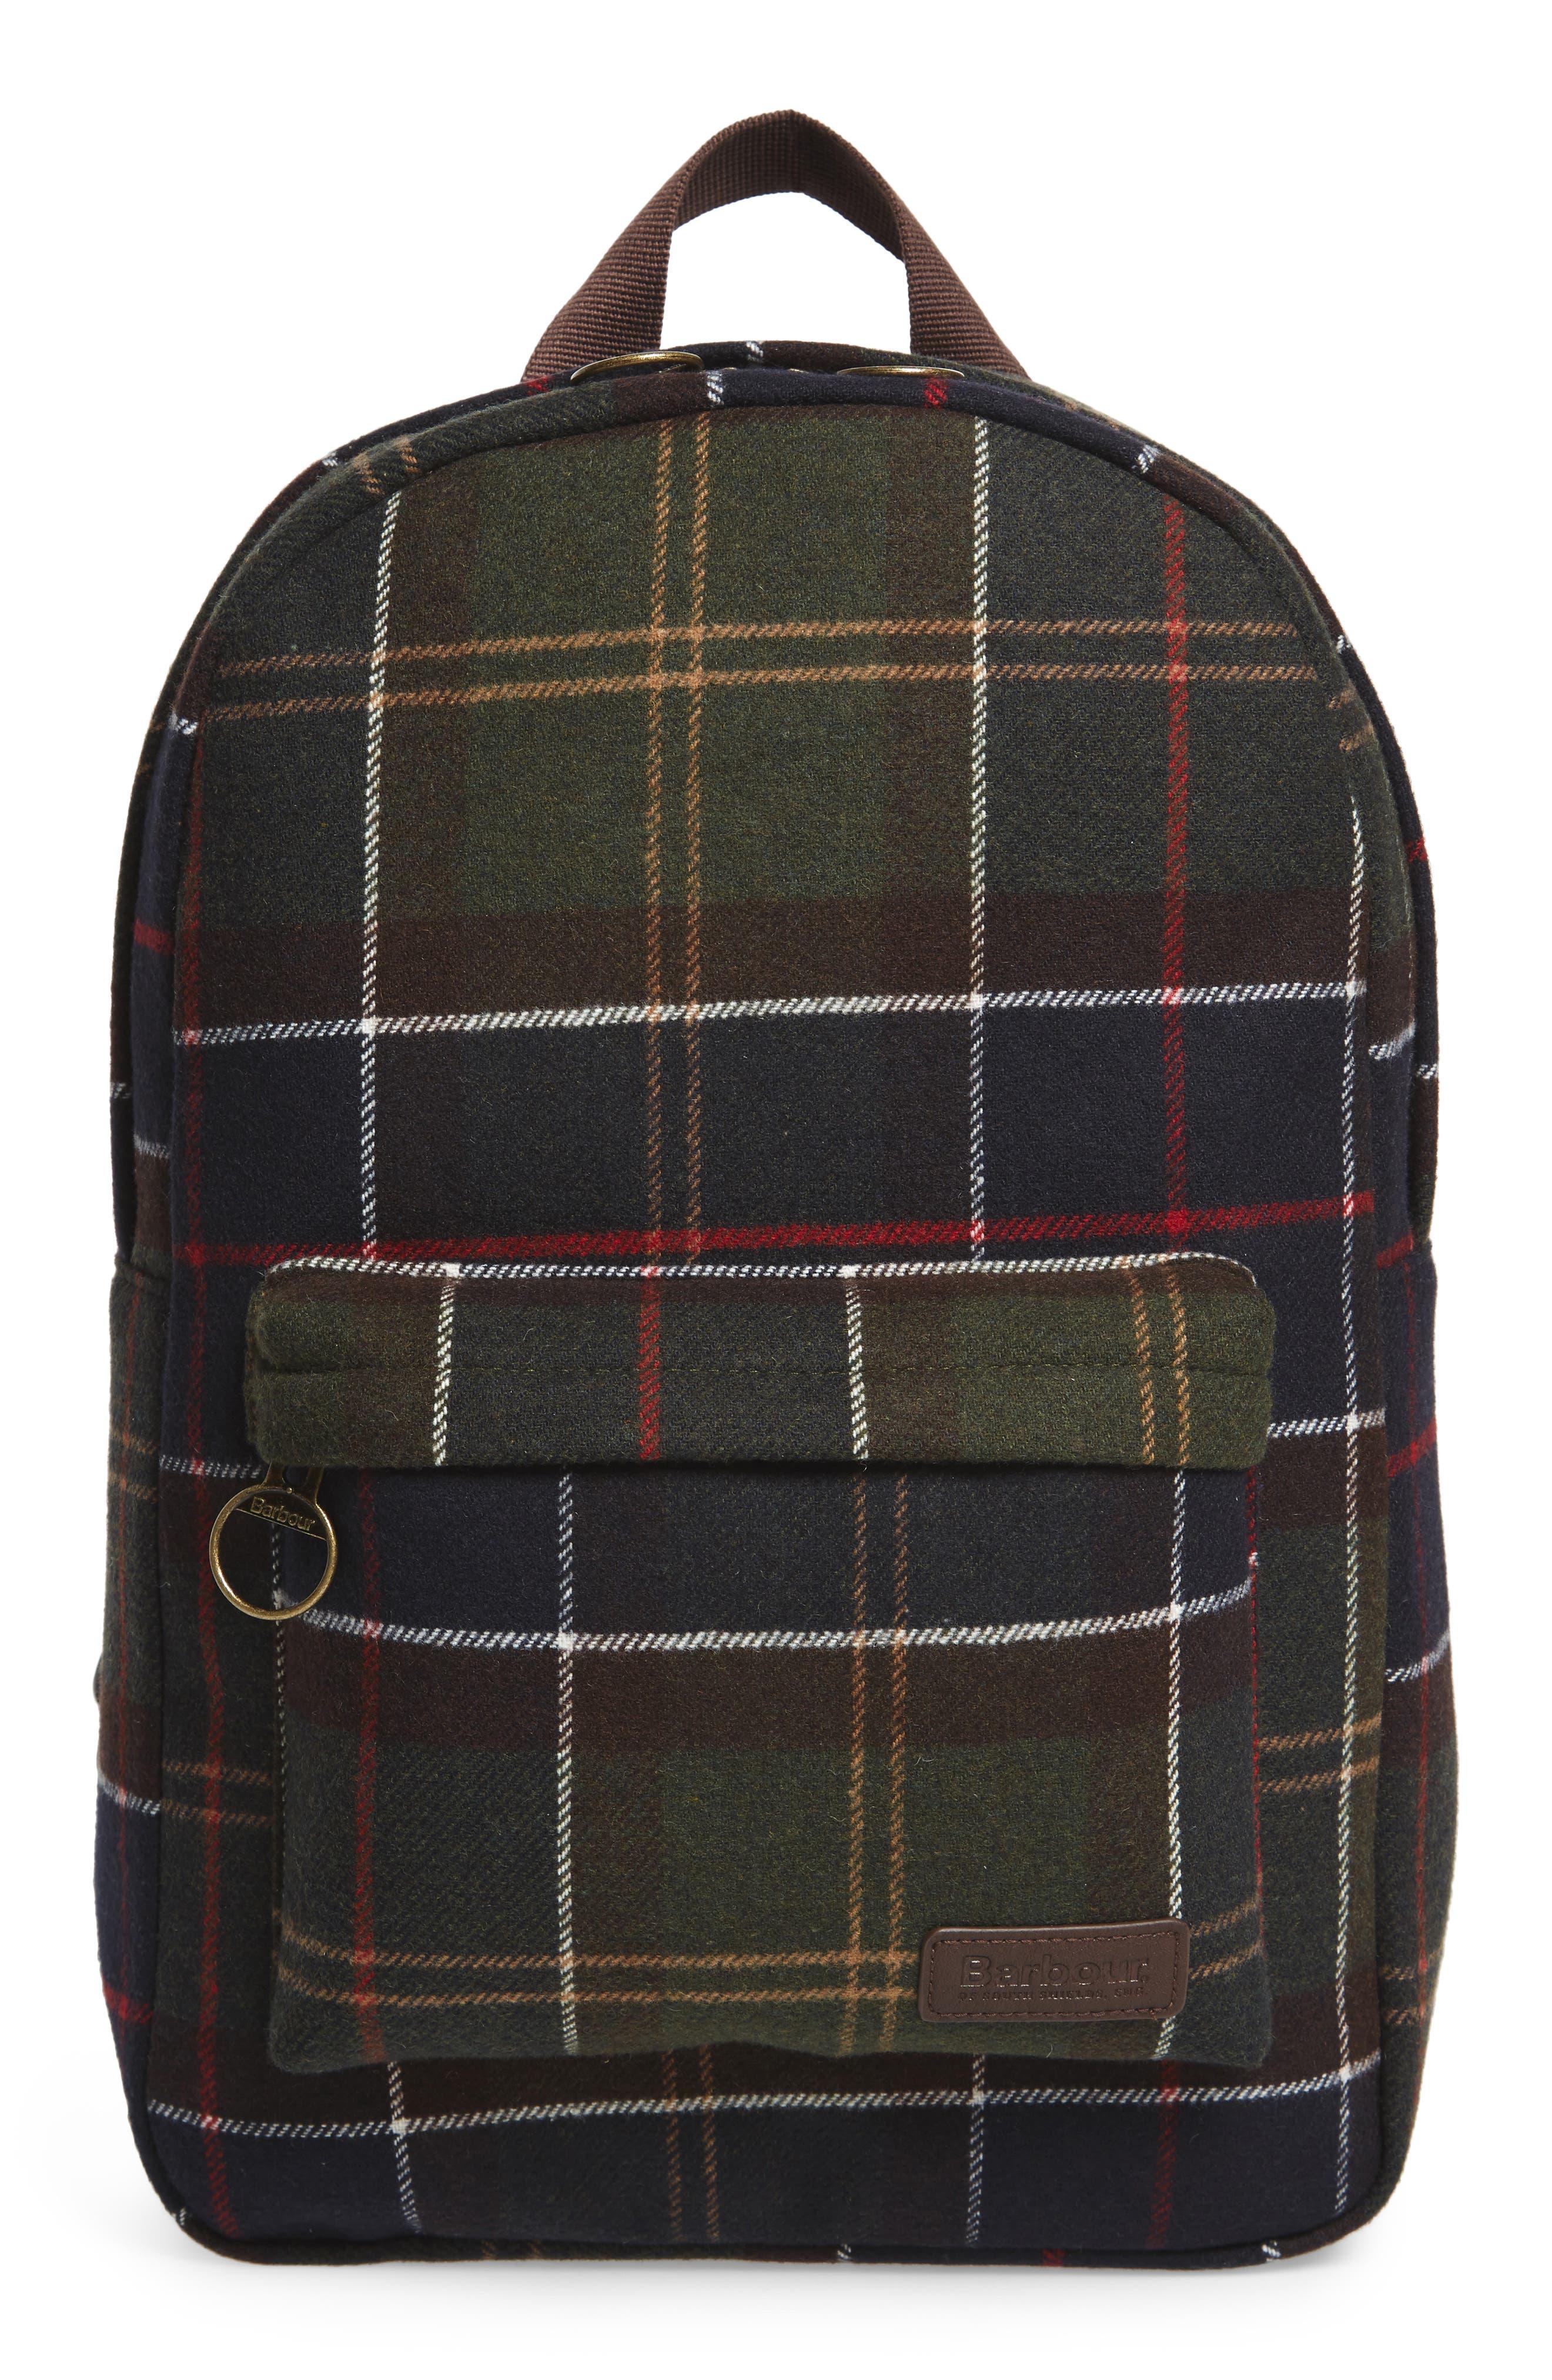 Carrbridge Backpack,                             Main thumbnail 1, color,                             300